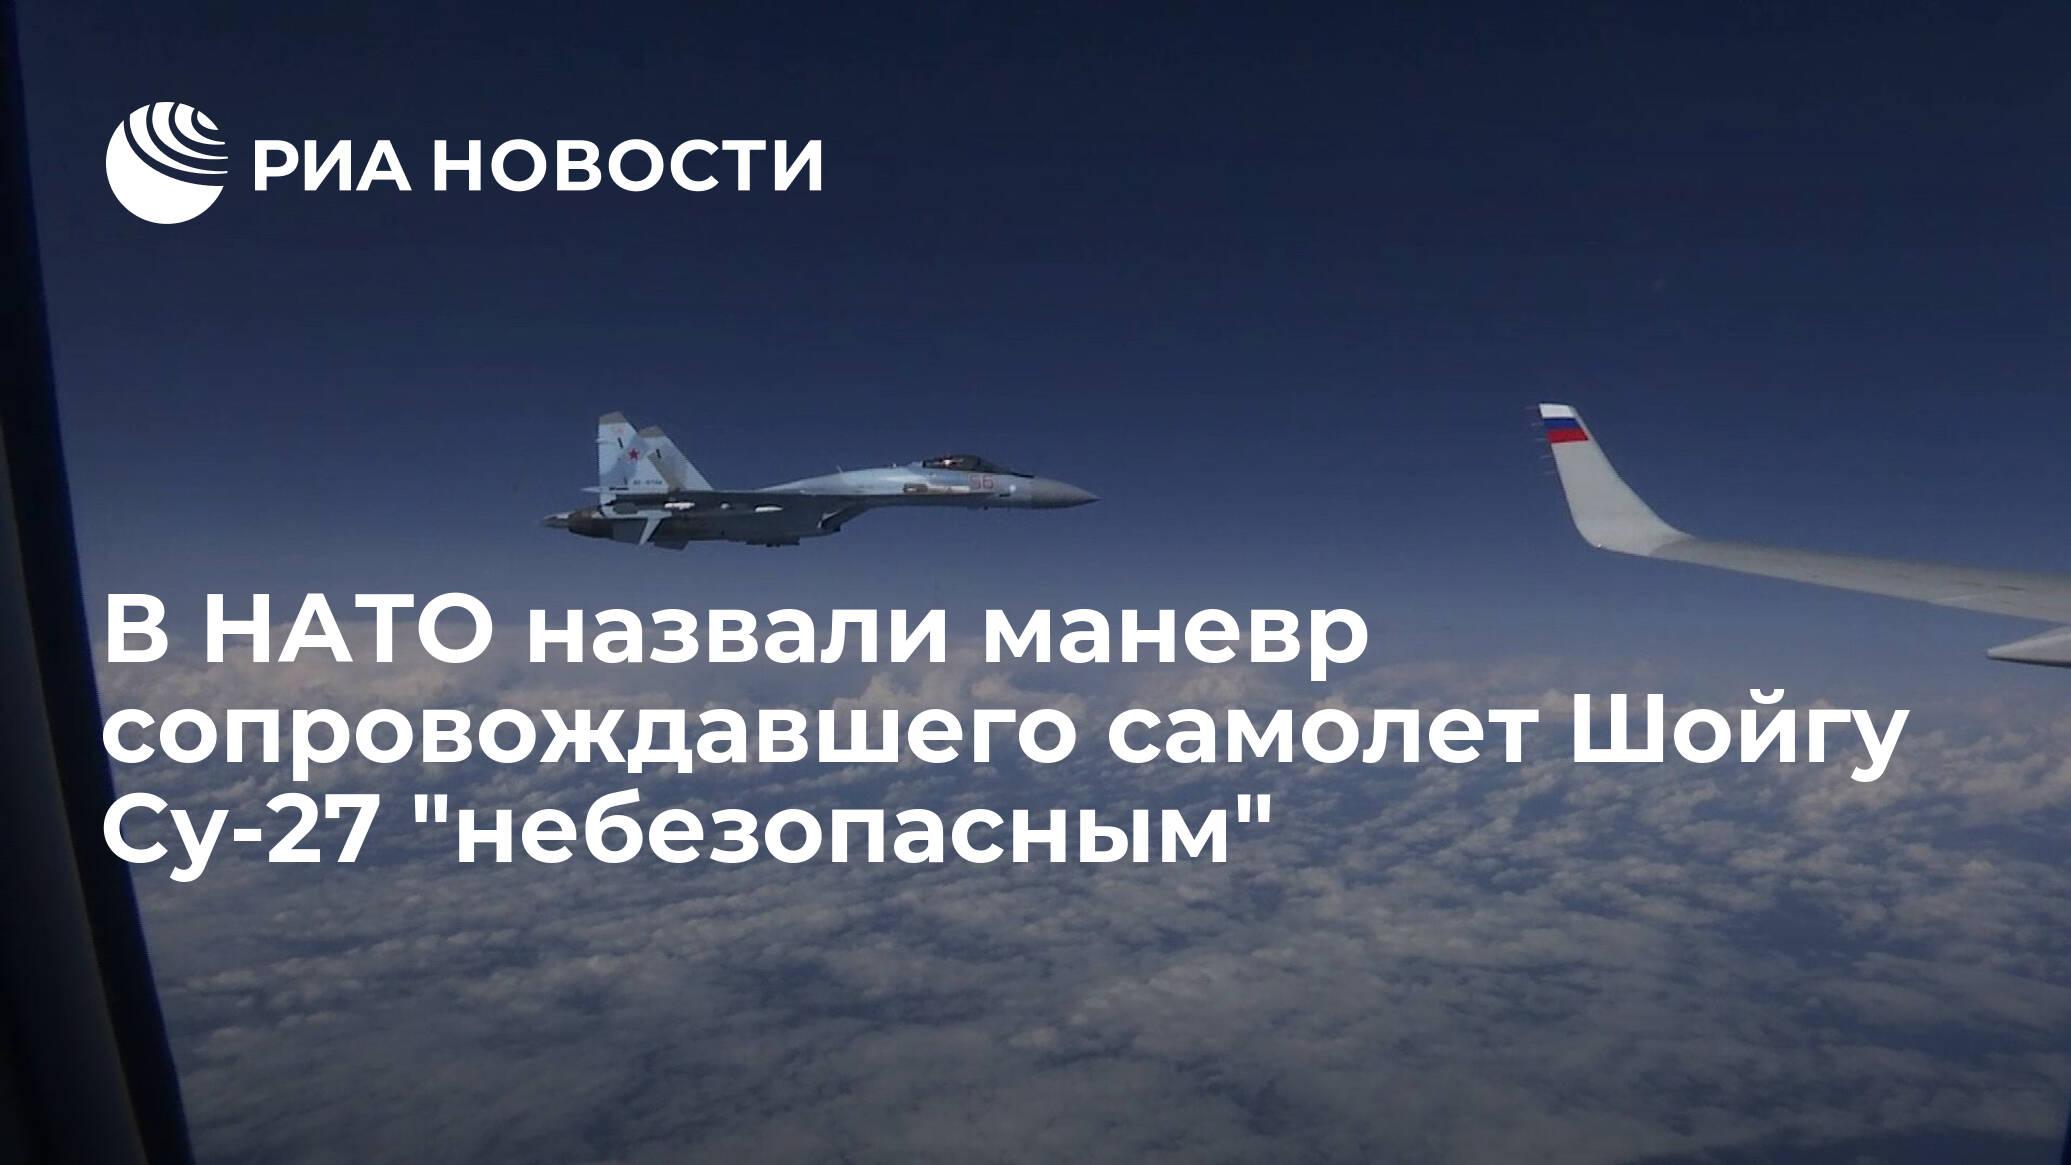 "НАТО назвала маневры Су-27 при инциденте с самолетом Шойгу ""небезопасными"" - РИА Новости, 14.08.2019"